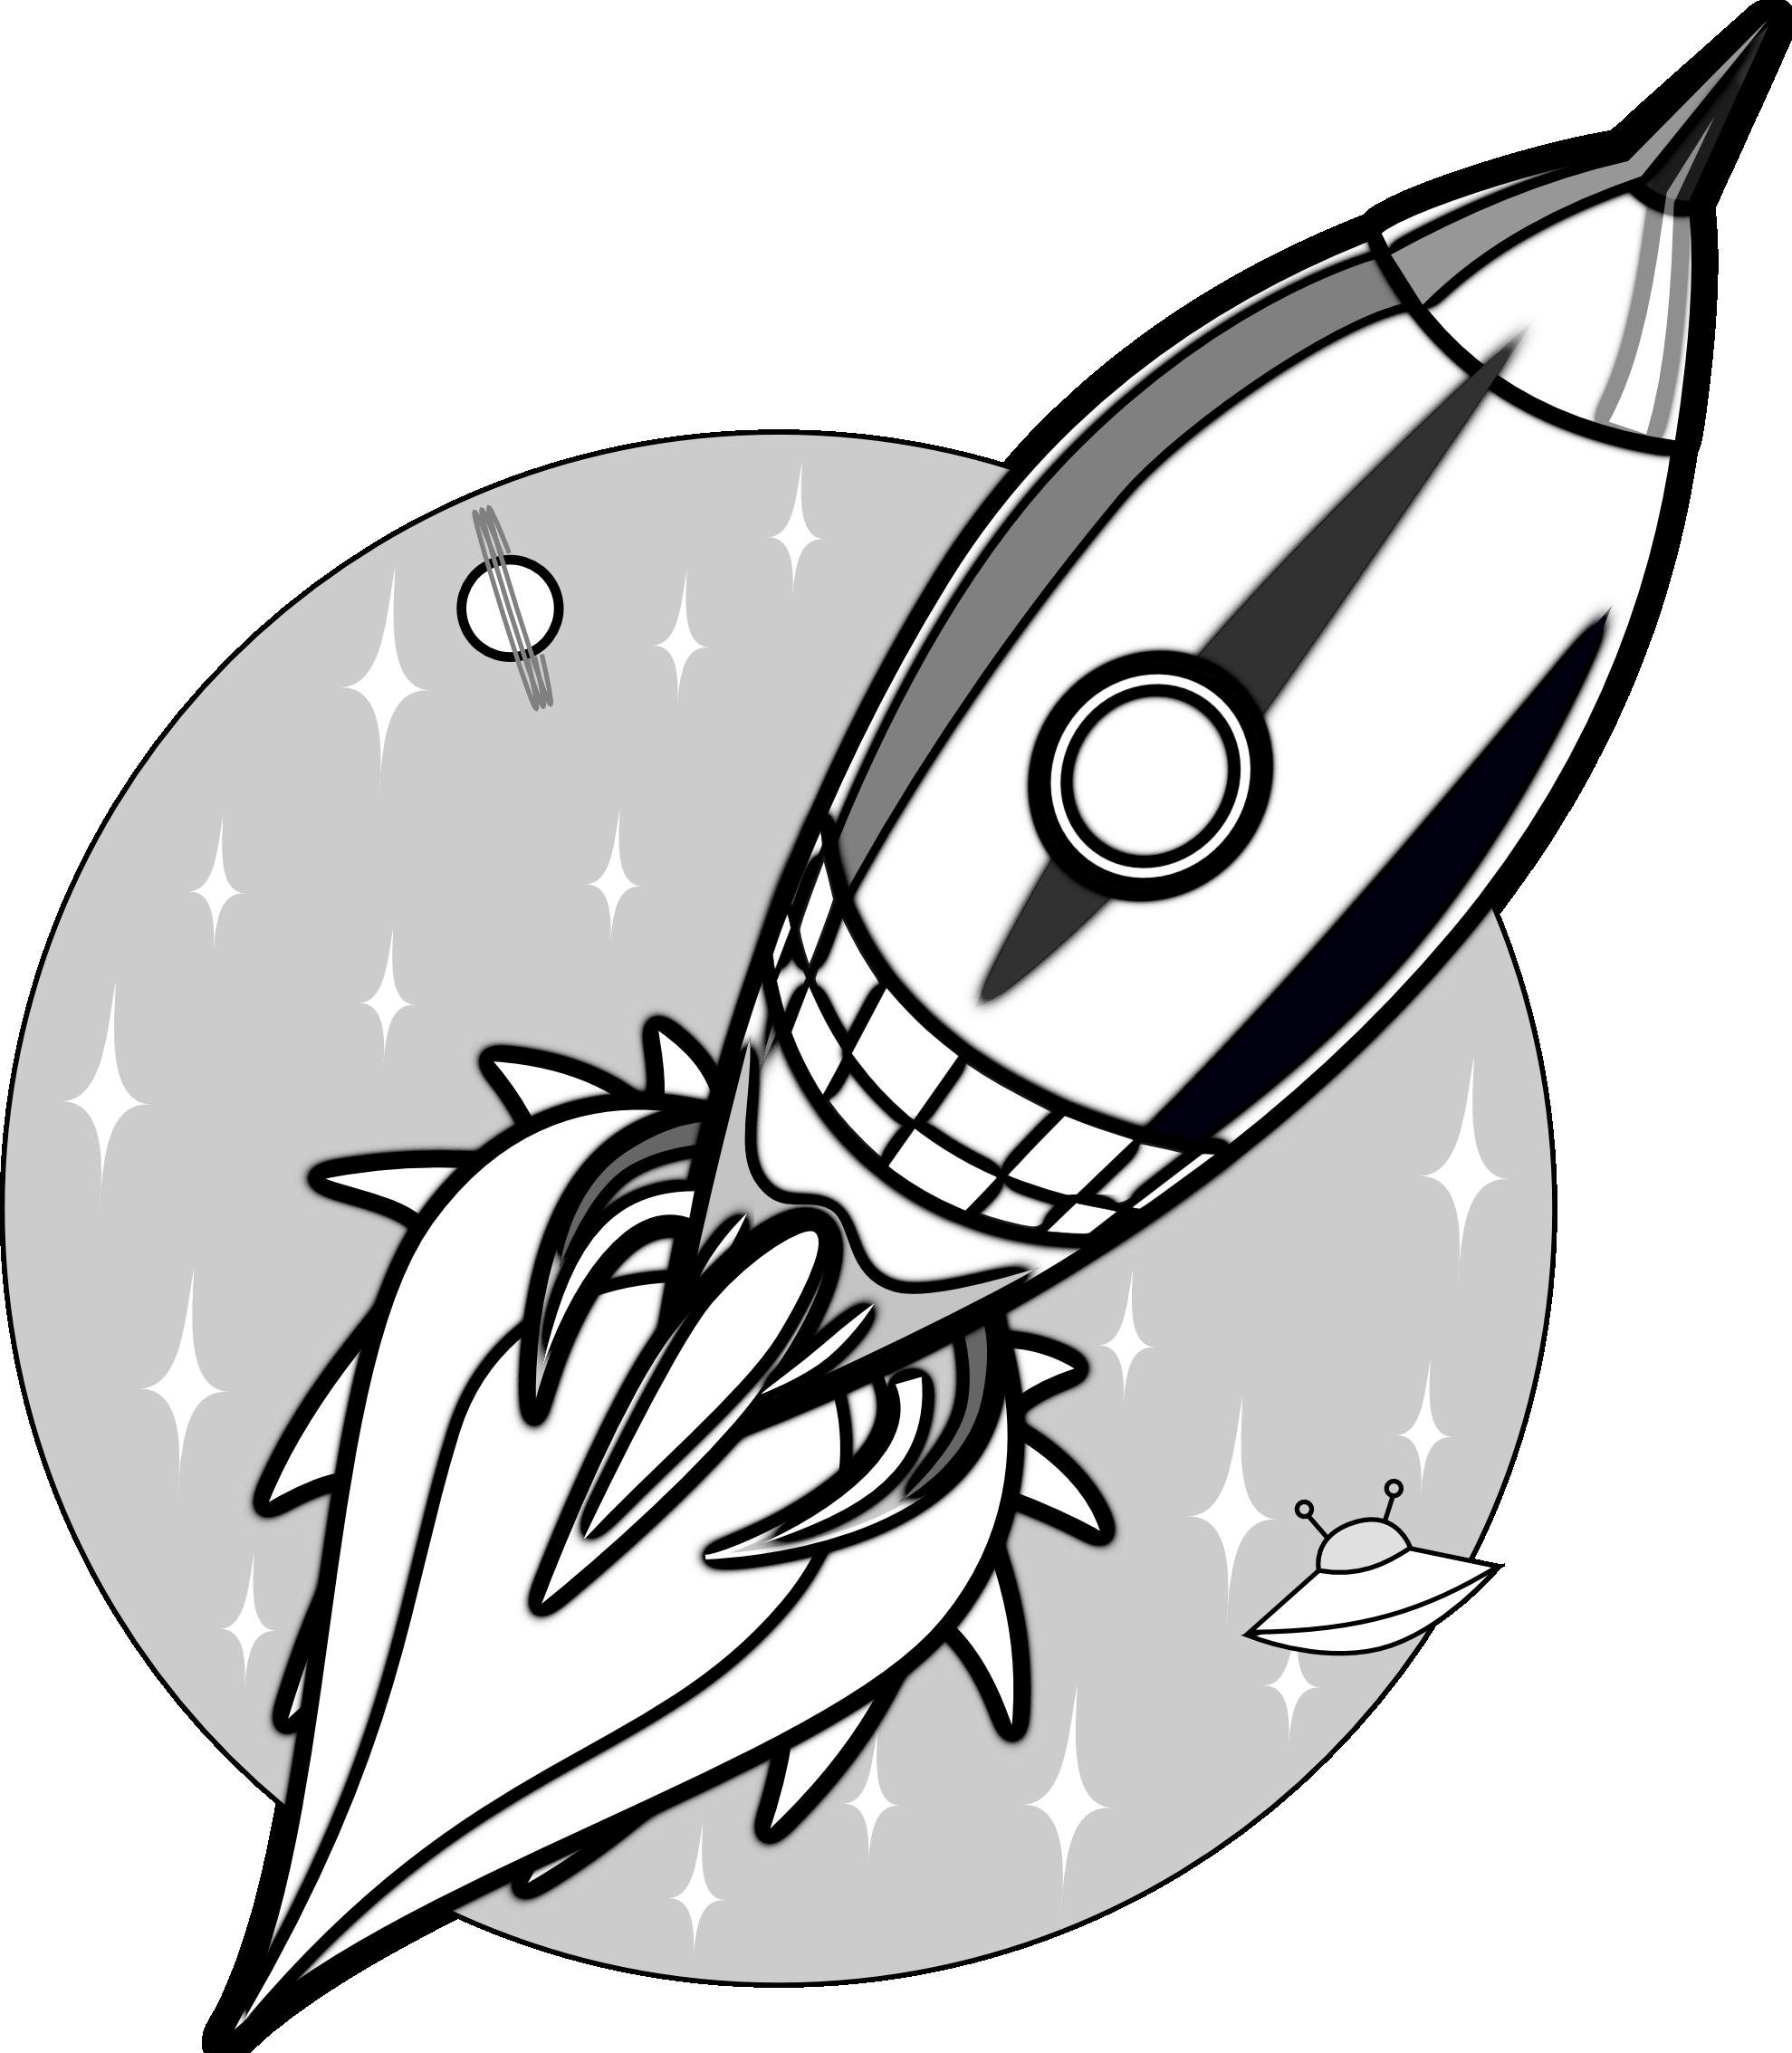 Space rocket clip art outline pics about space 2 image.